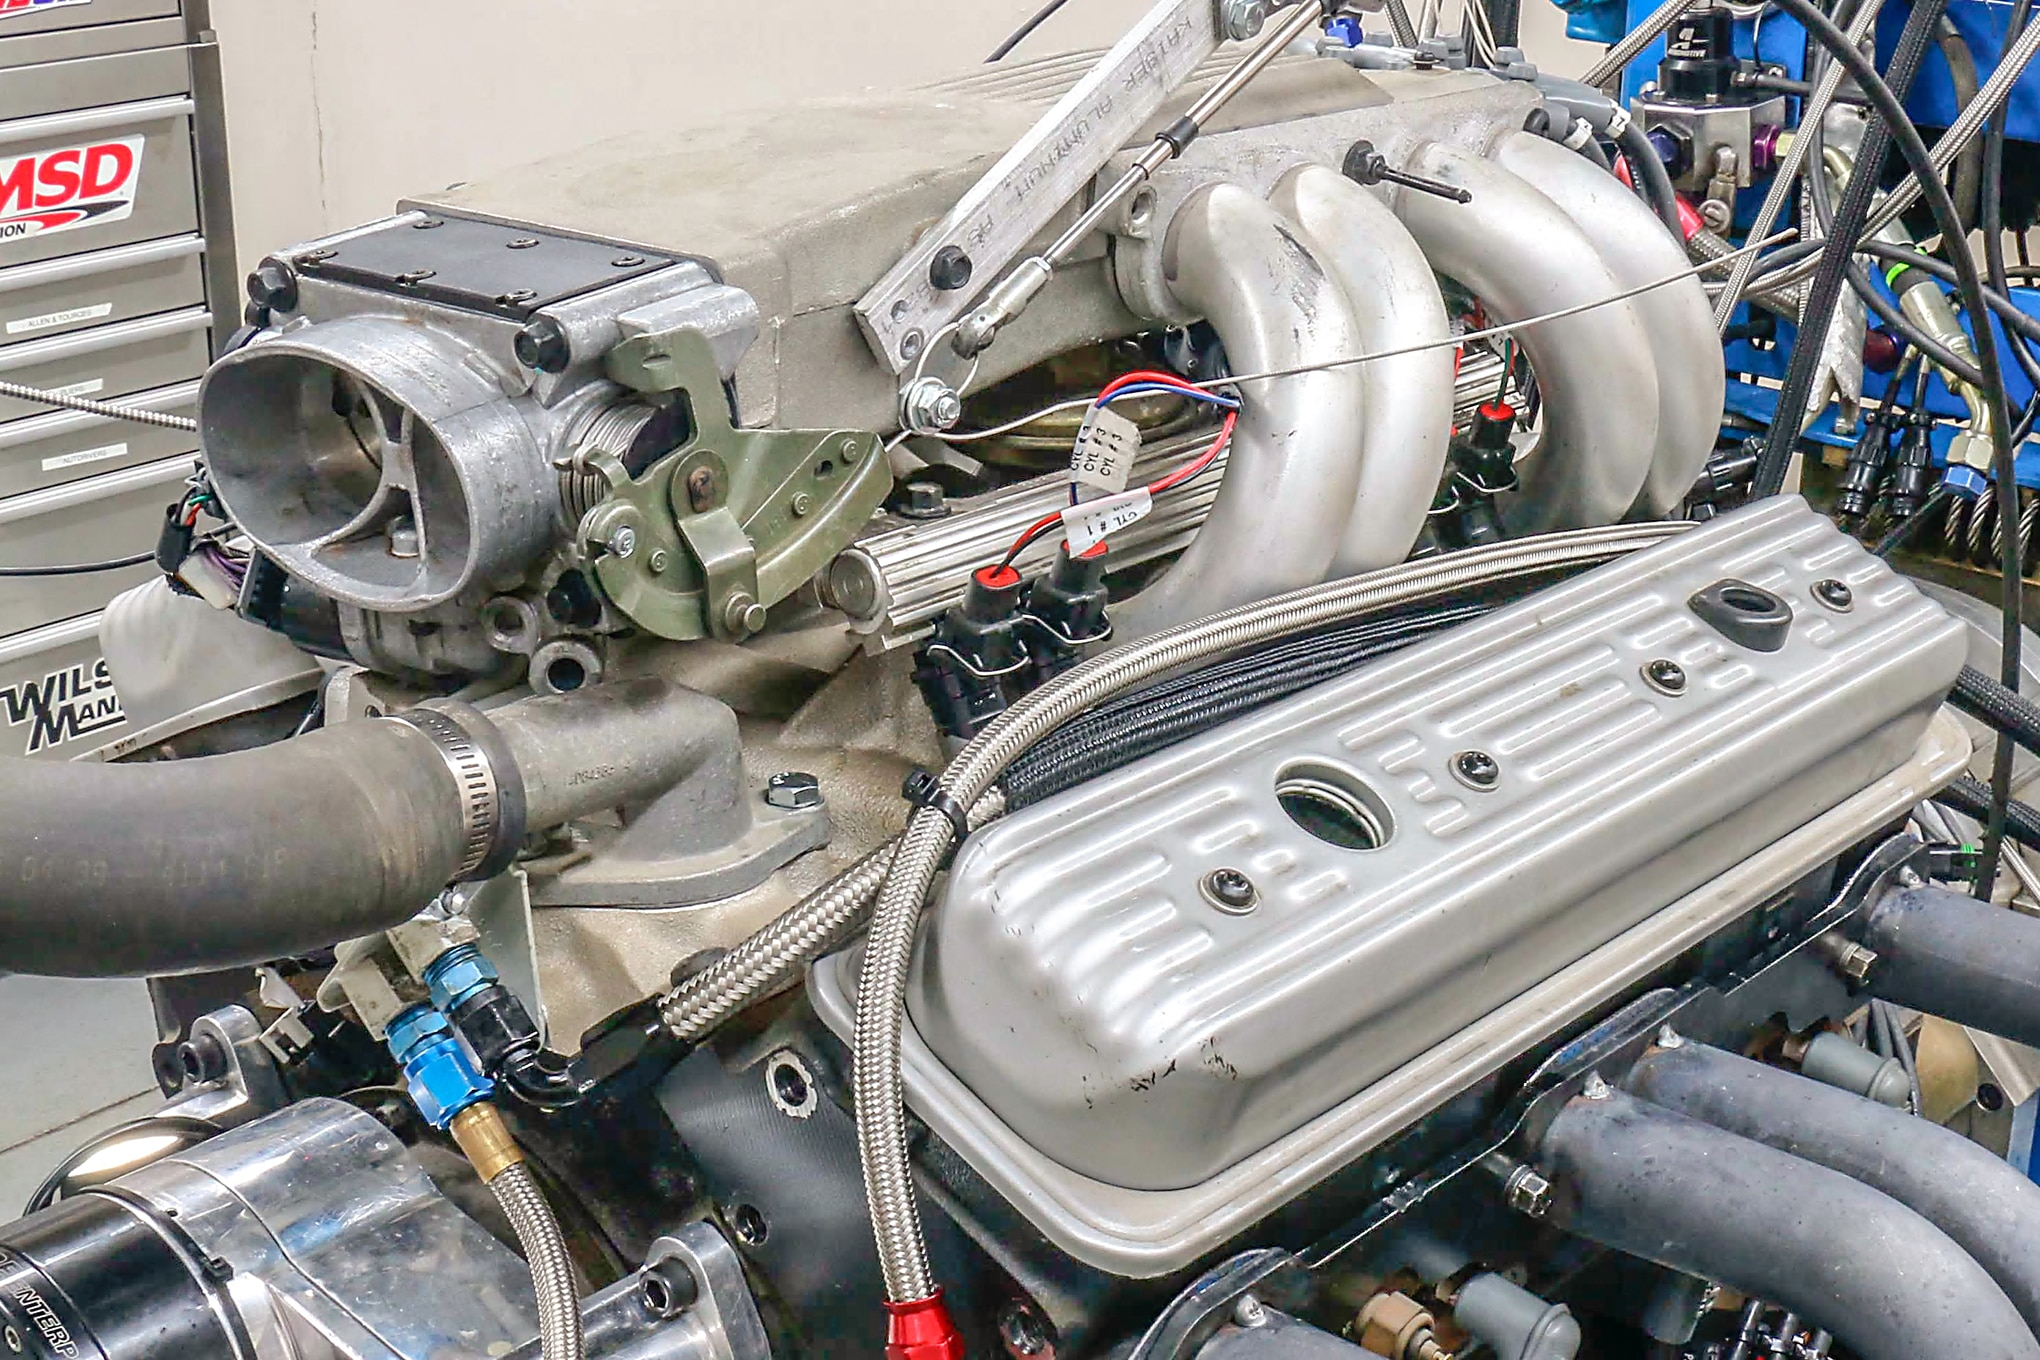 gm s quad 4 ecotec engines and ford s zetec duratec engines hot rod network [ 1920:1280 x 1920 Pixel ]